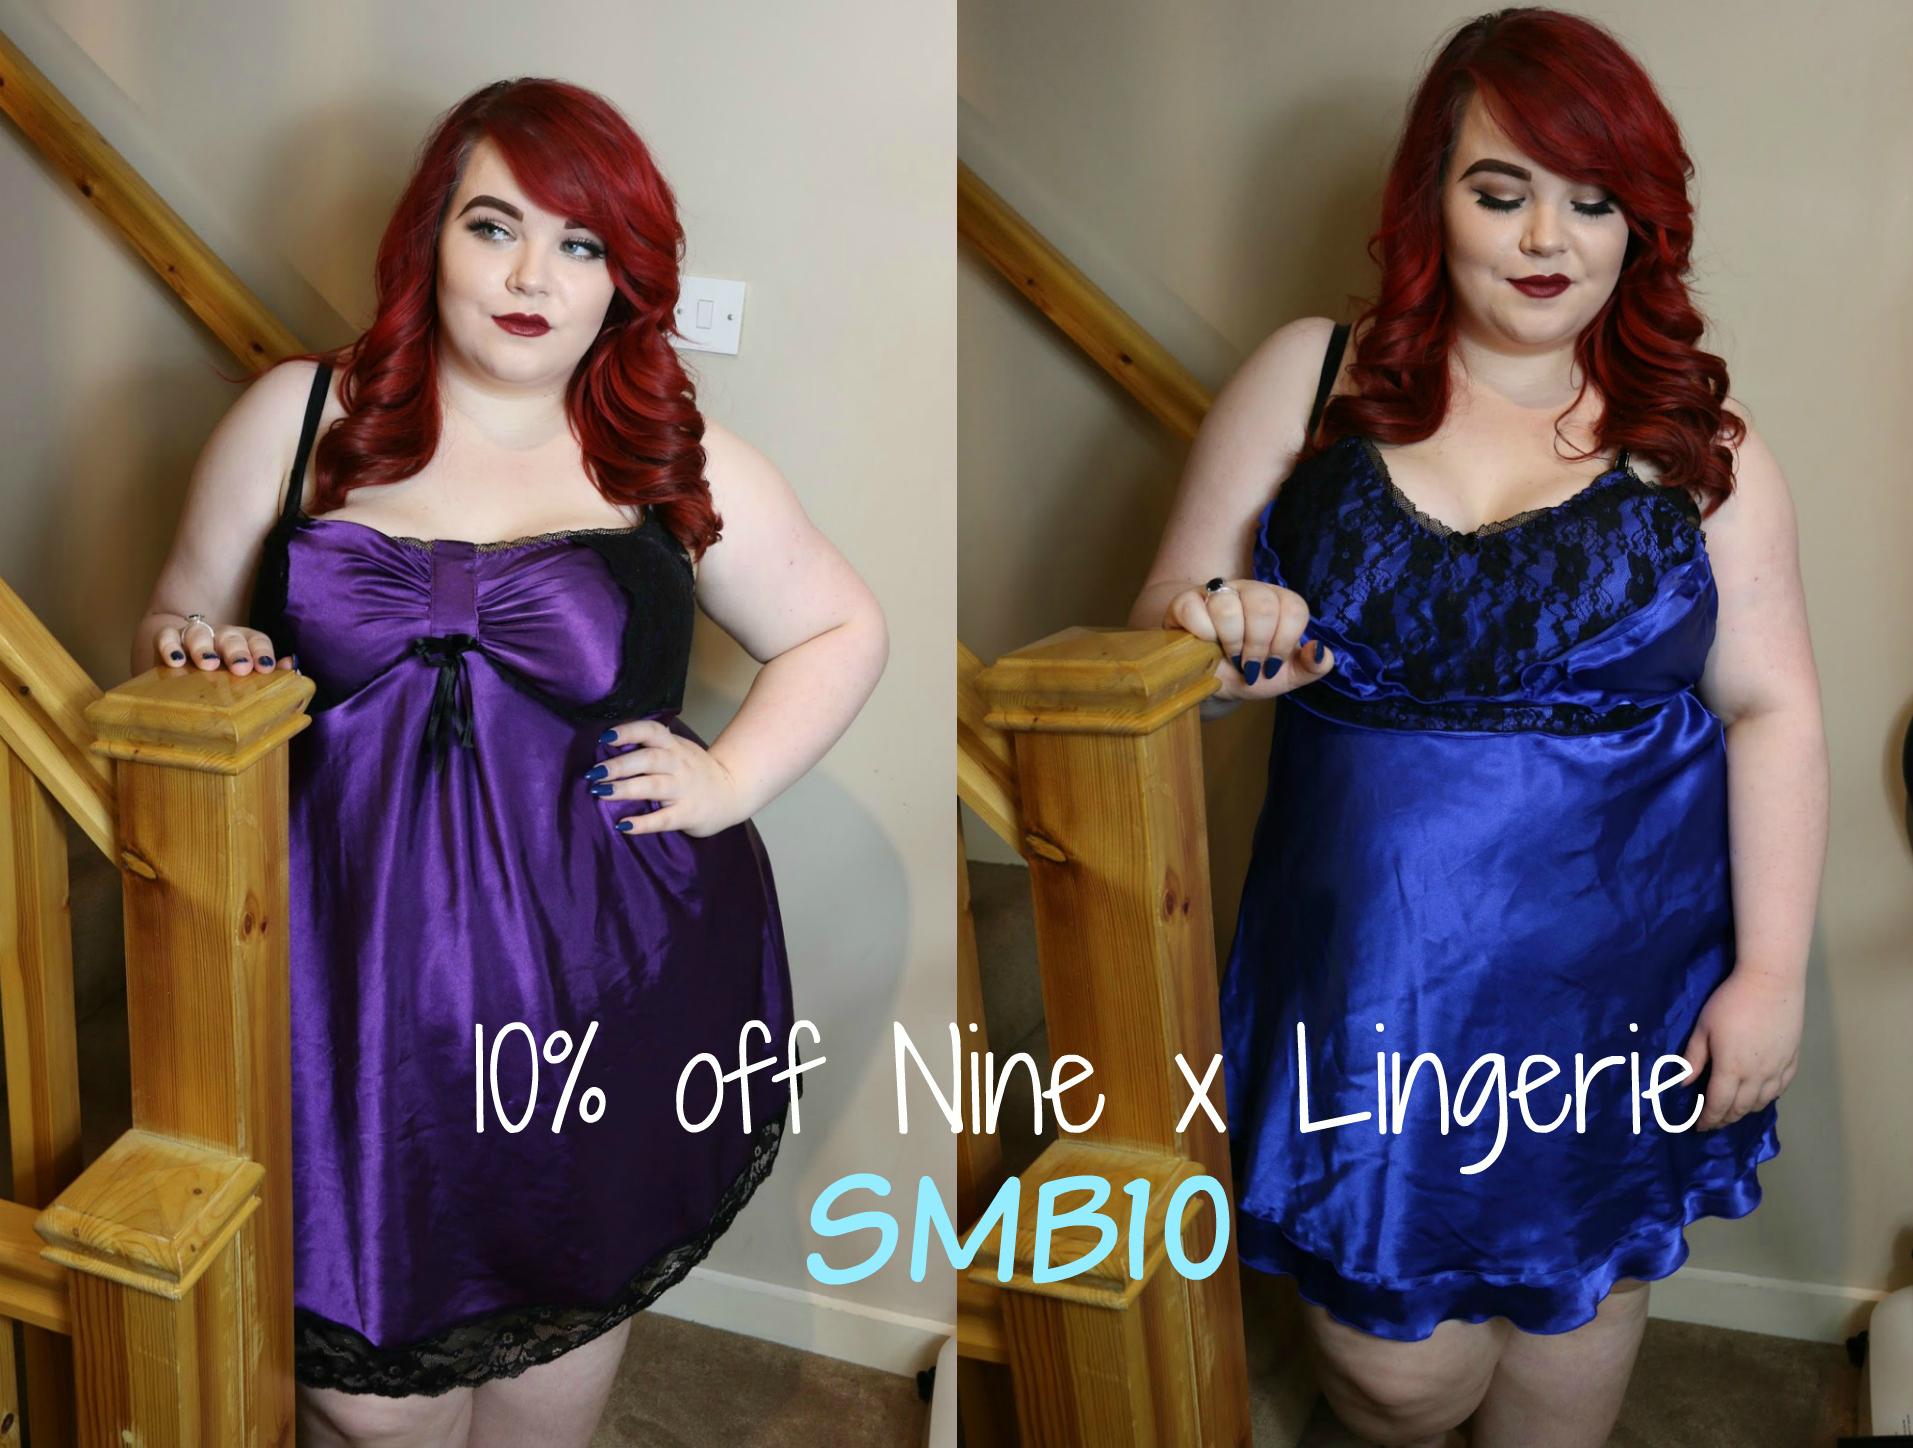 nine x lingerie discount code